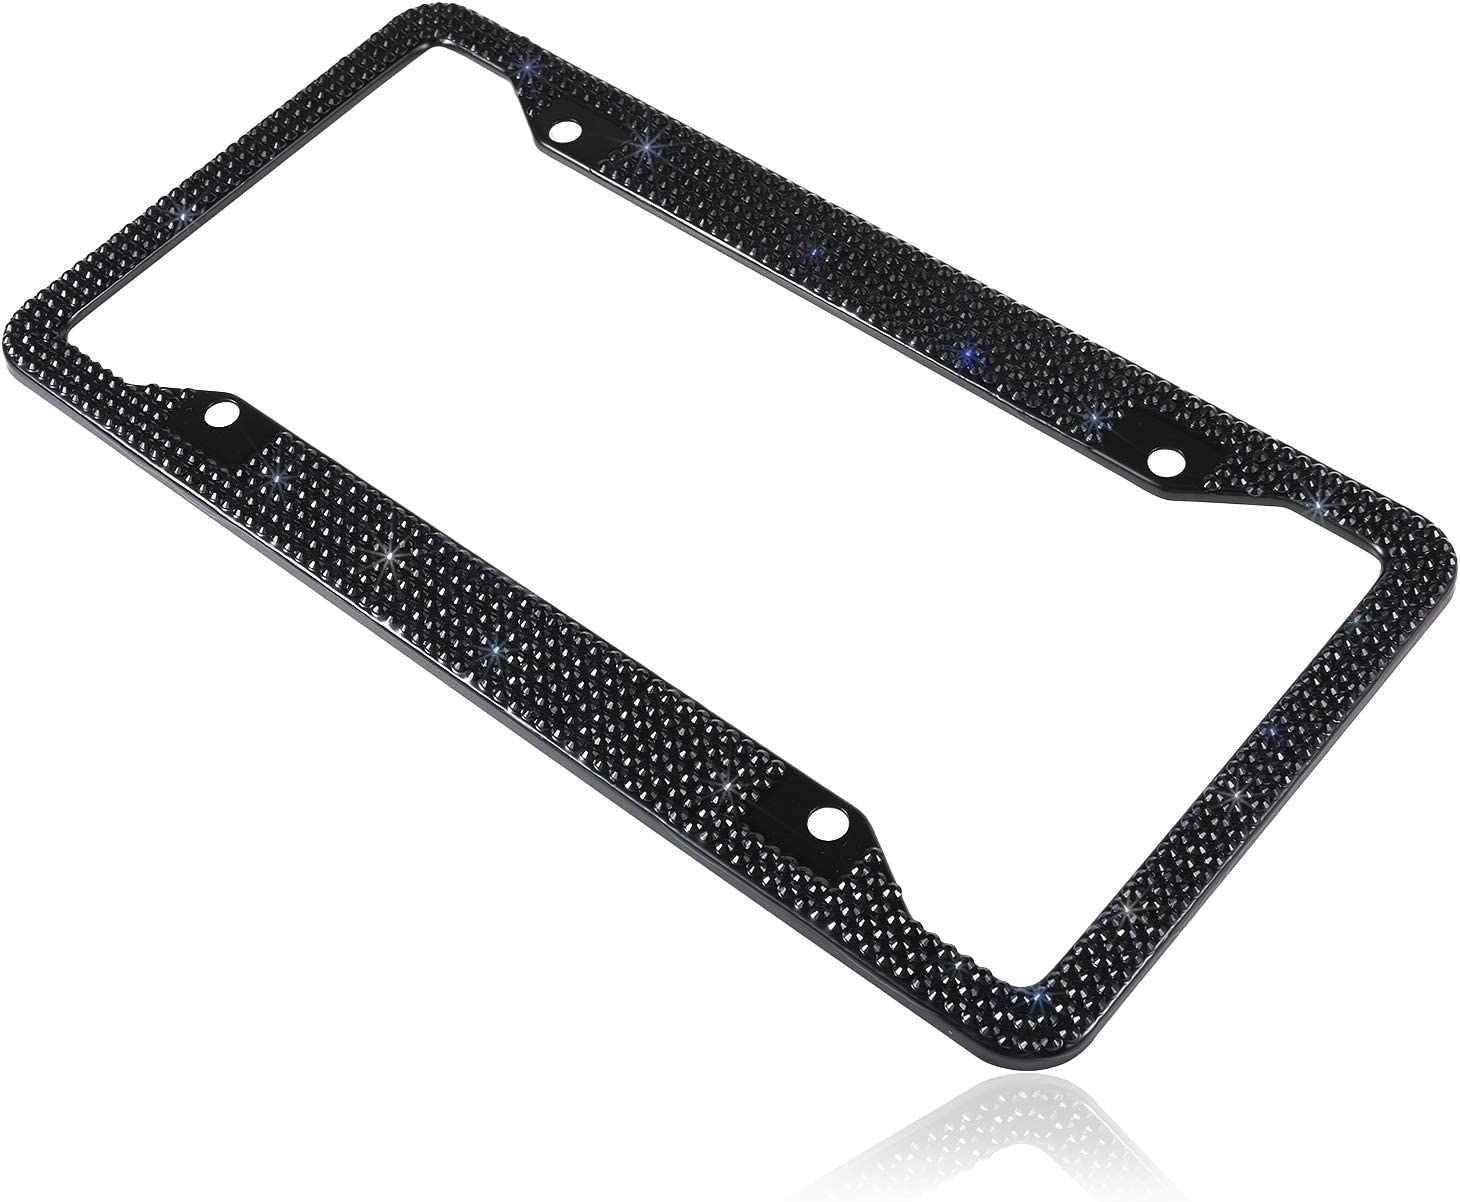 1 Frame Better Solution Fashion 4 Holes Handmade Sparkle Black Bling Crystal License Plate Frame Cover Cute Rhinestone Gift License Plate Holder for Cars,SUV,Truck